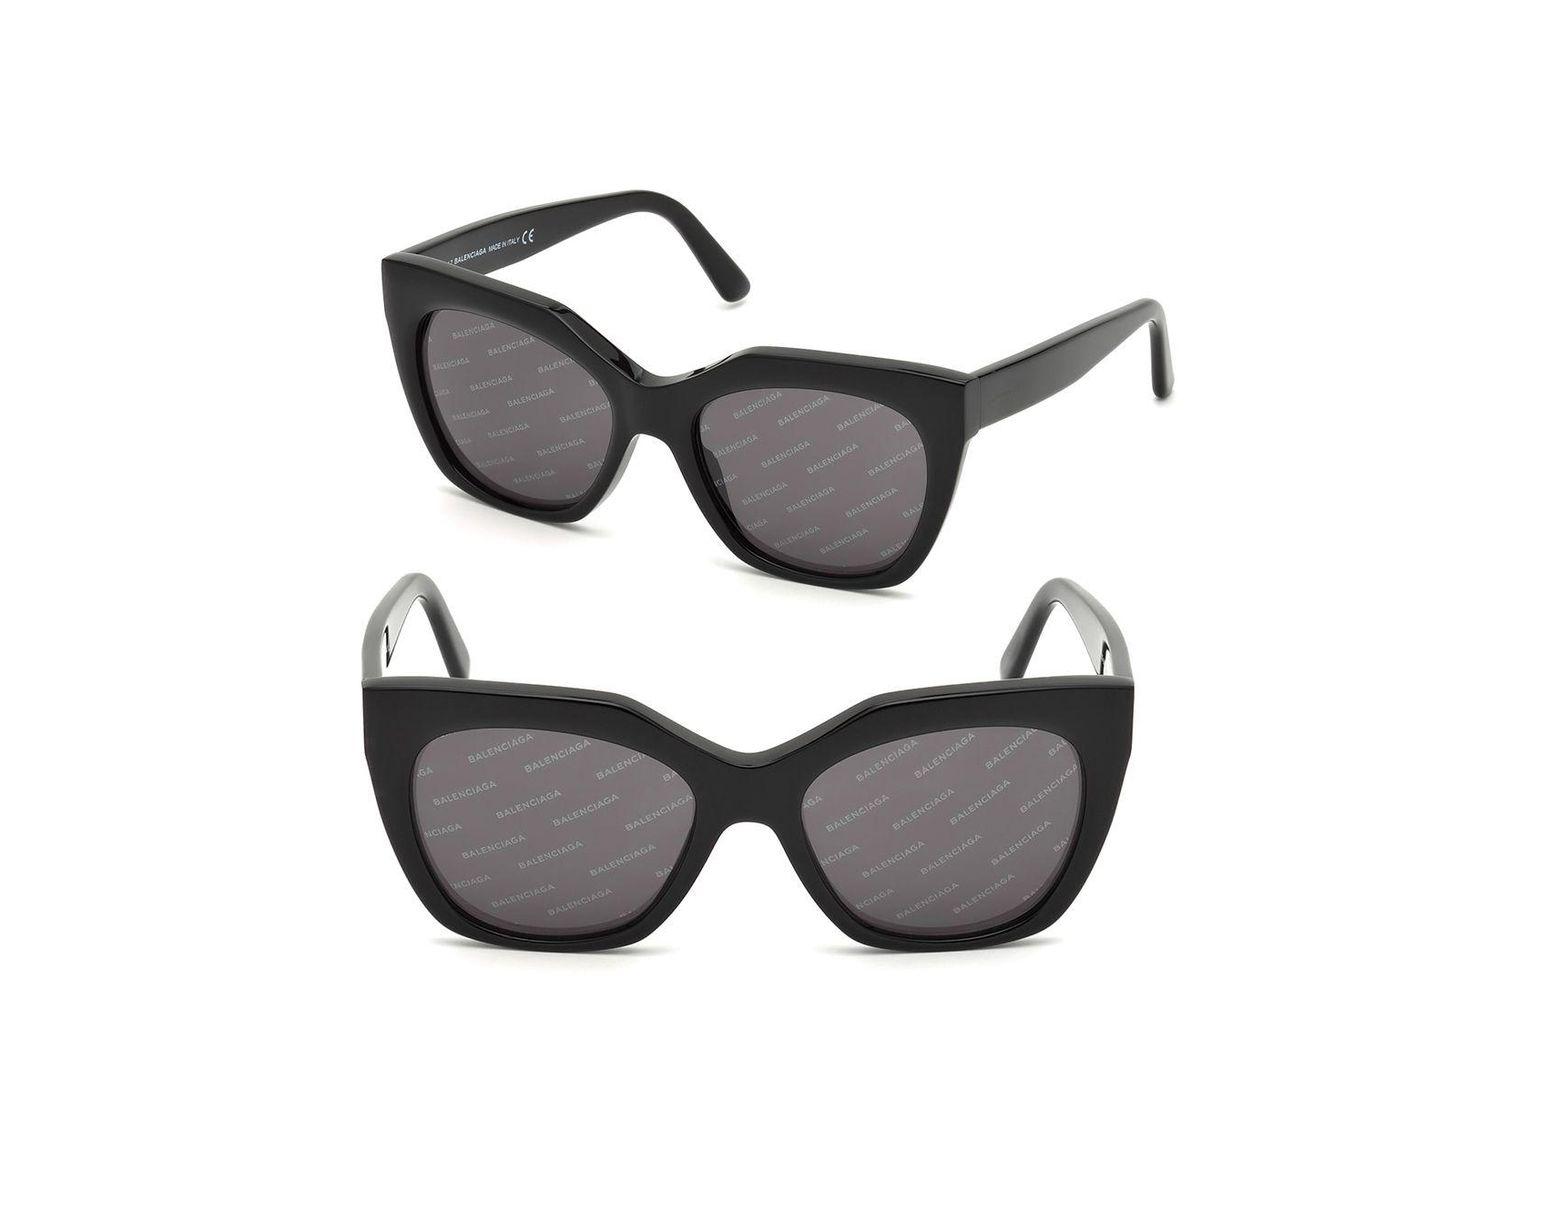 39d1e34af0a3 Balenciaga Soft Square Sunglasses in Black - Save 75% - Lyst